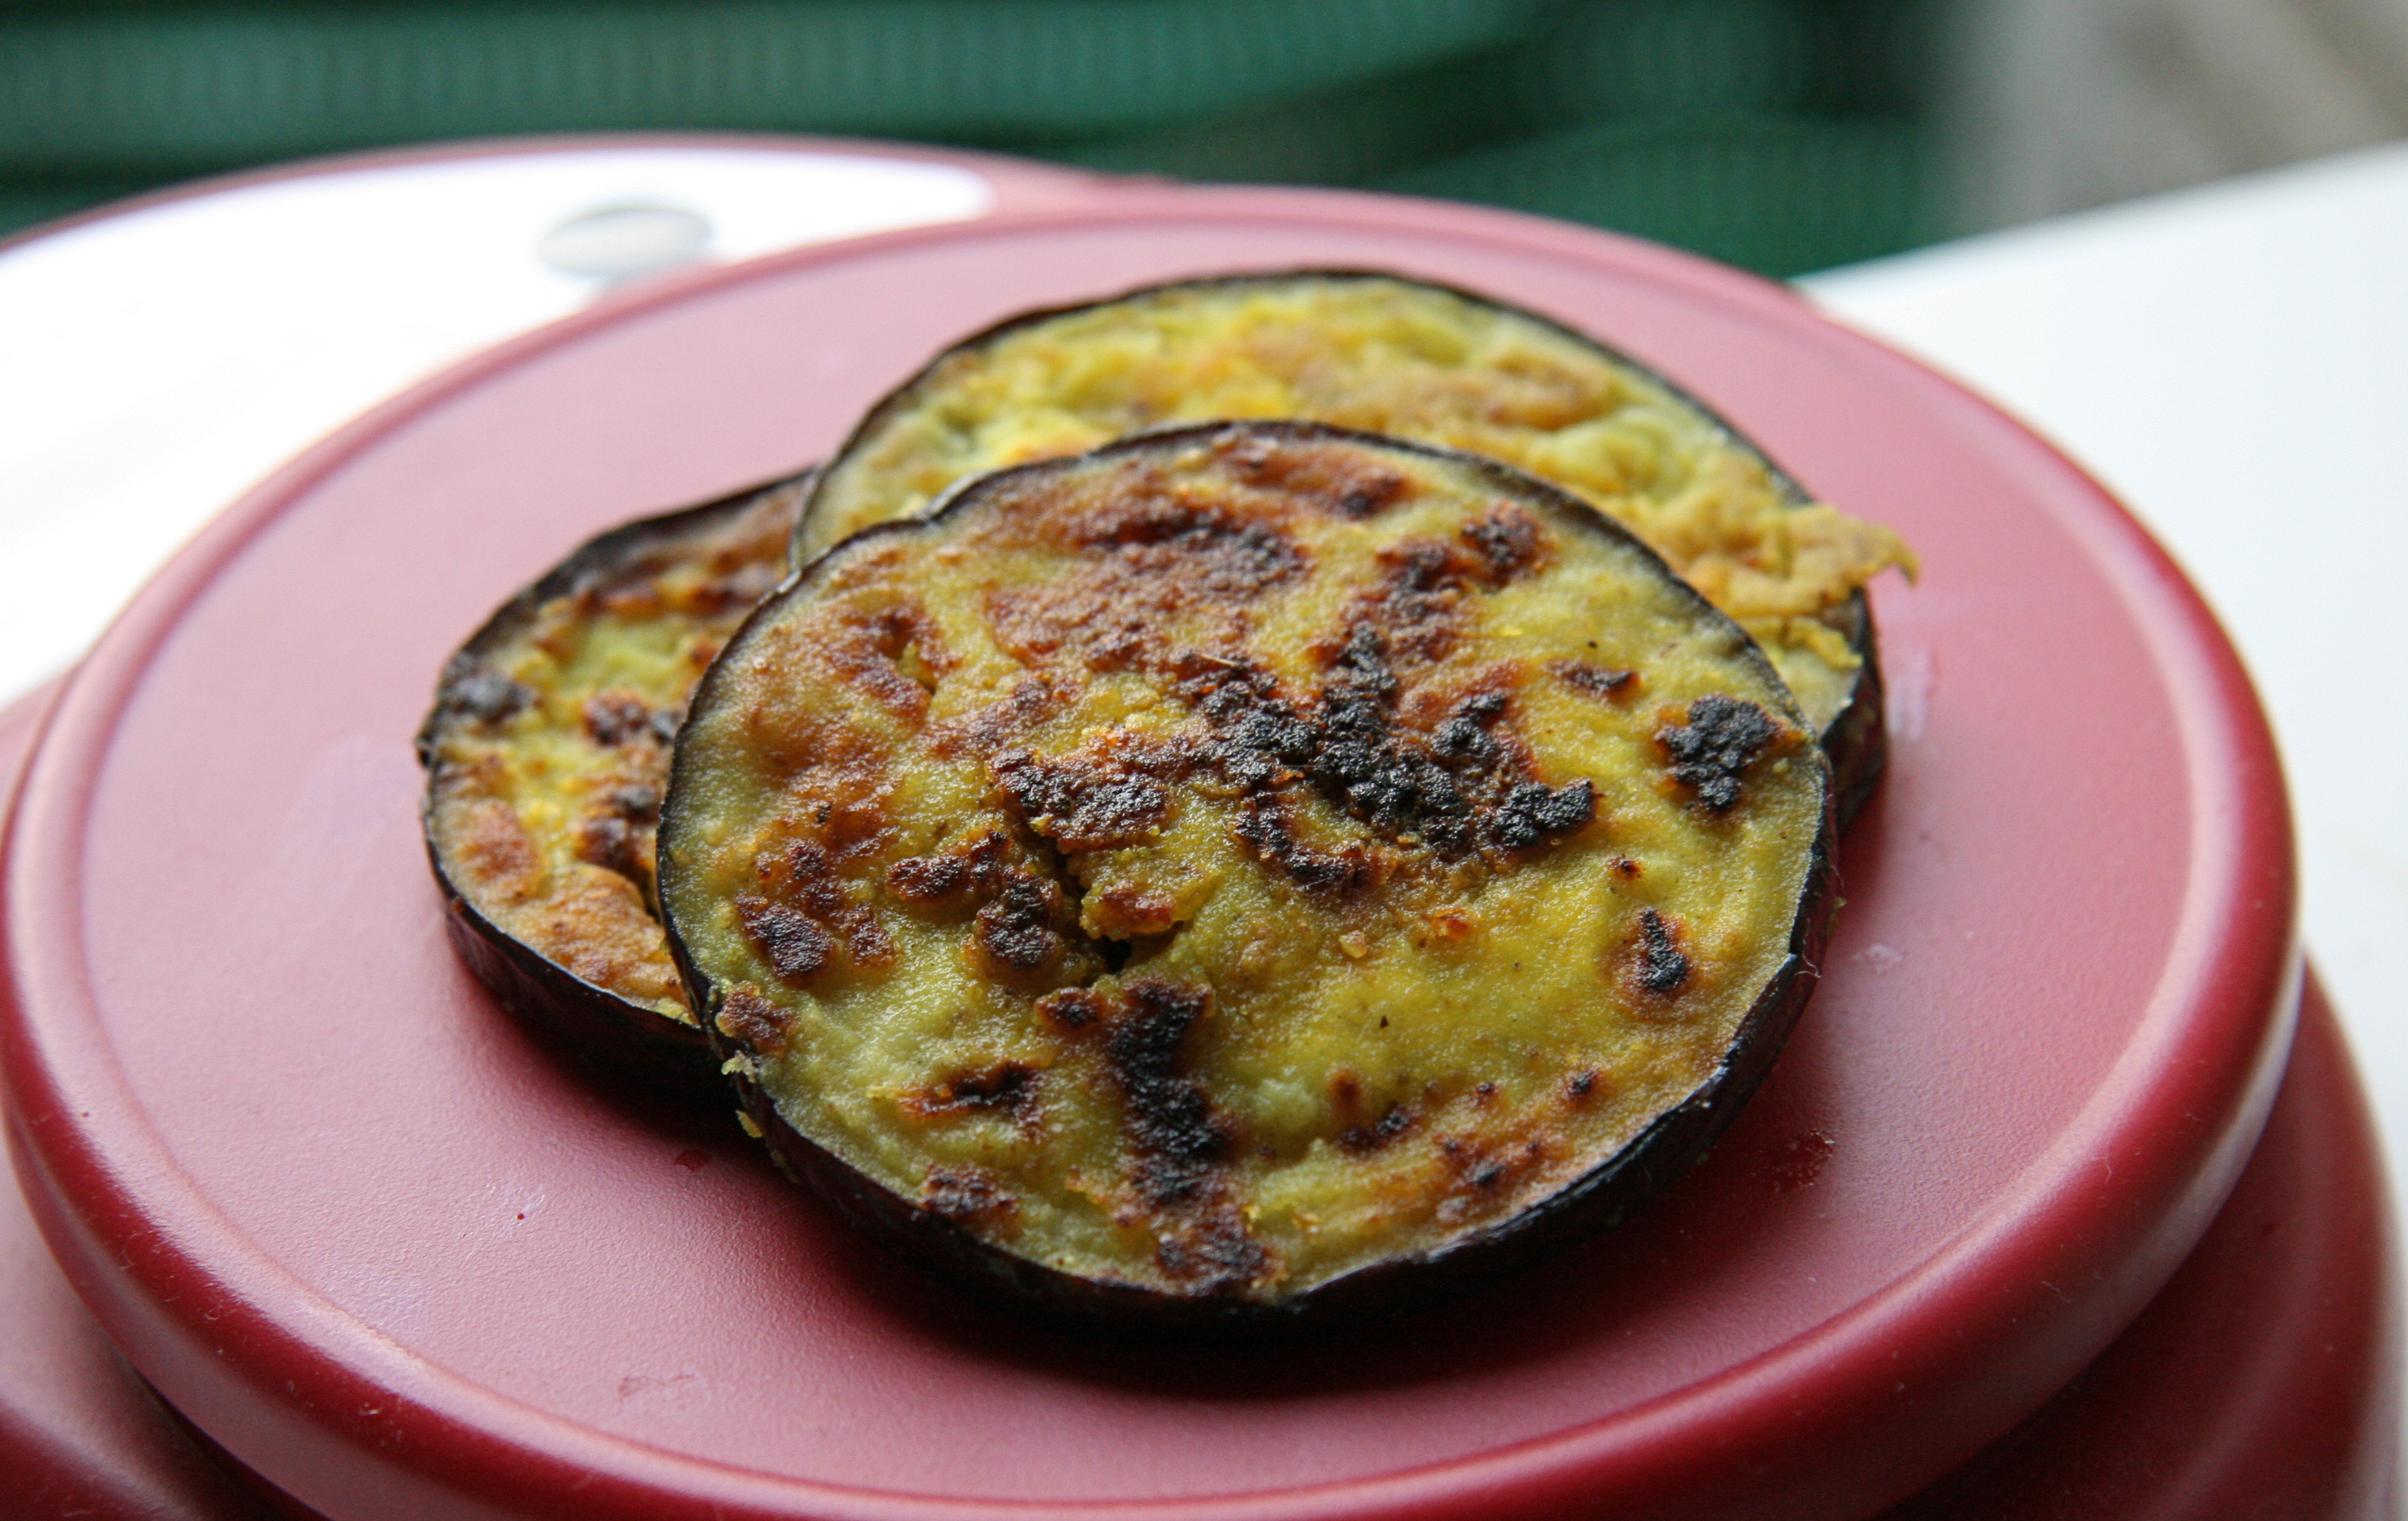 Indian Eggplant Recipes  Eggplant Papeta Indian spiced eggplant appetizer